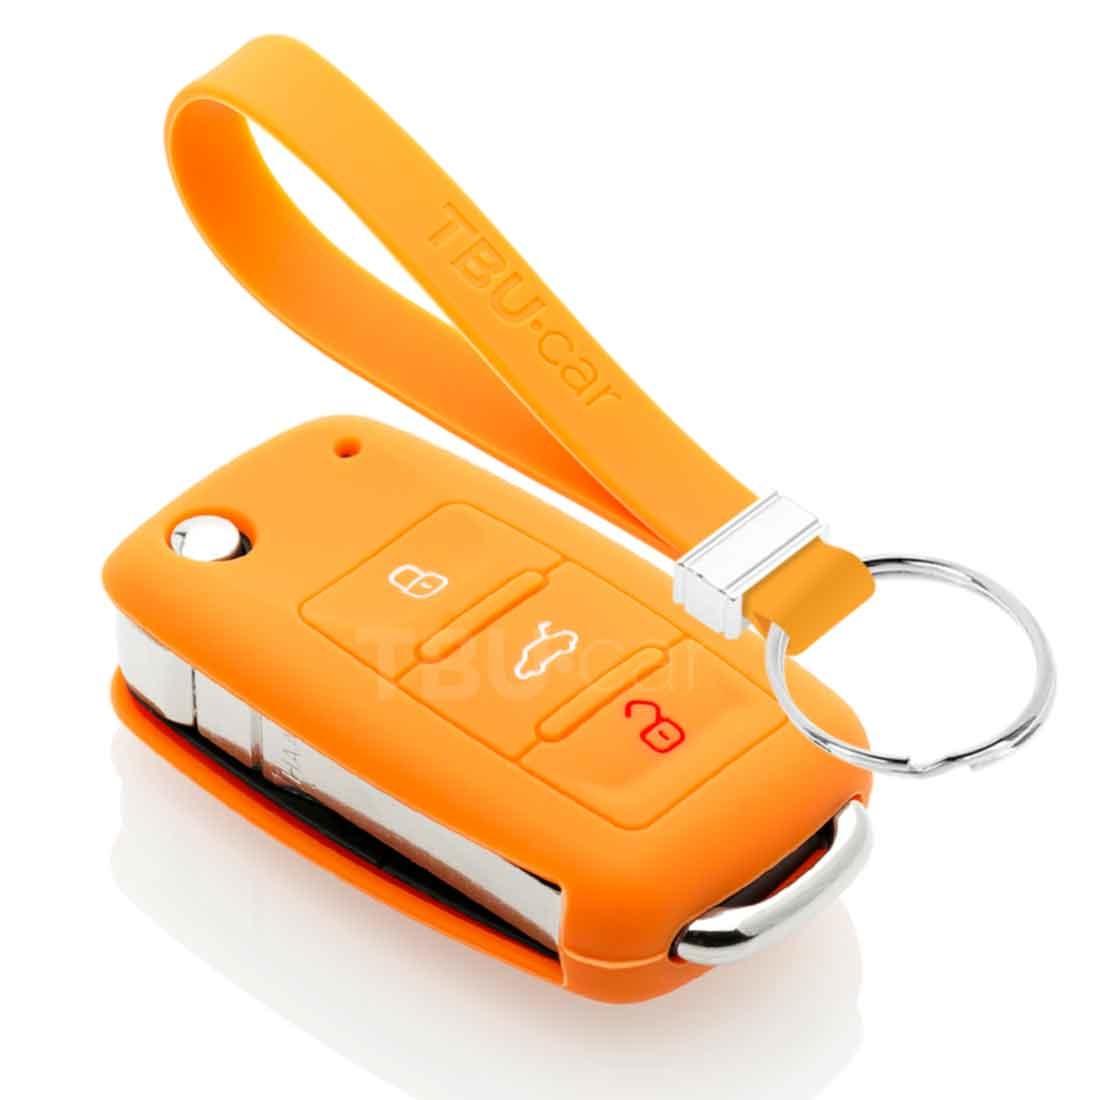 TBU car TBU car Sleutel cover compatibel met VW - Silicone sleutelhoesje - beschermhoesje autosleutel - Oranje